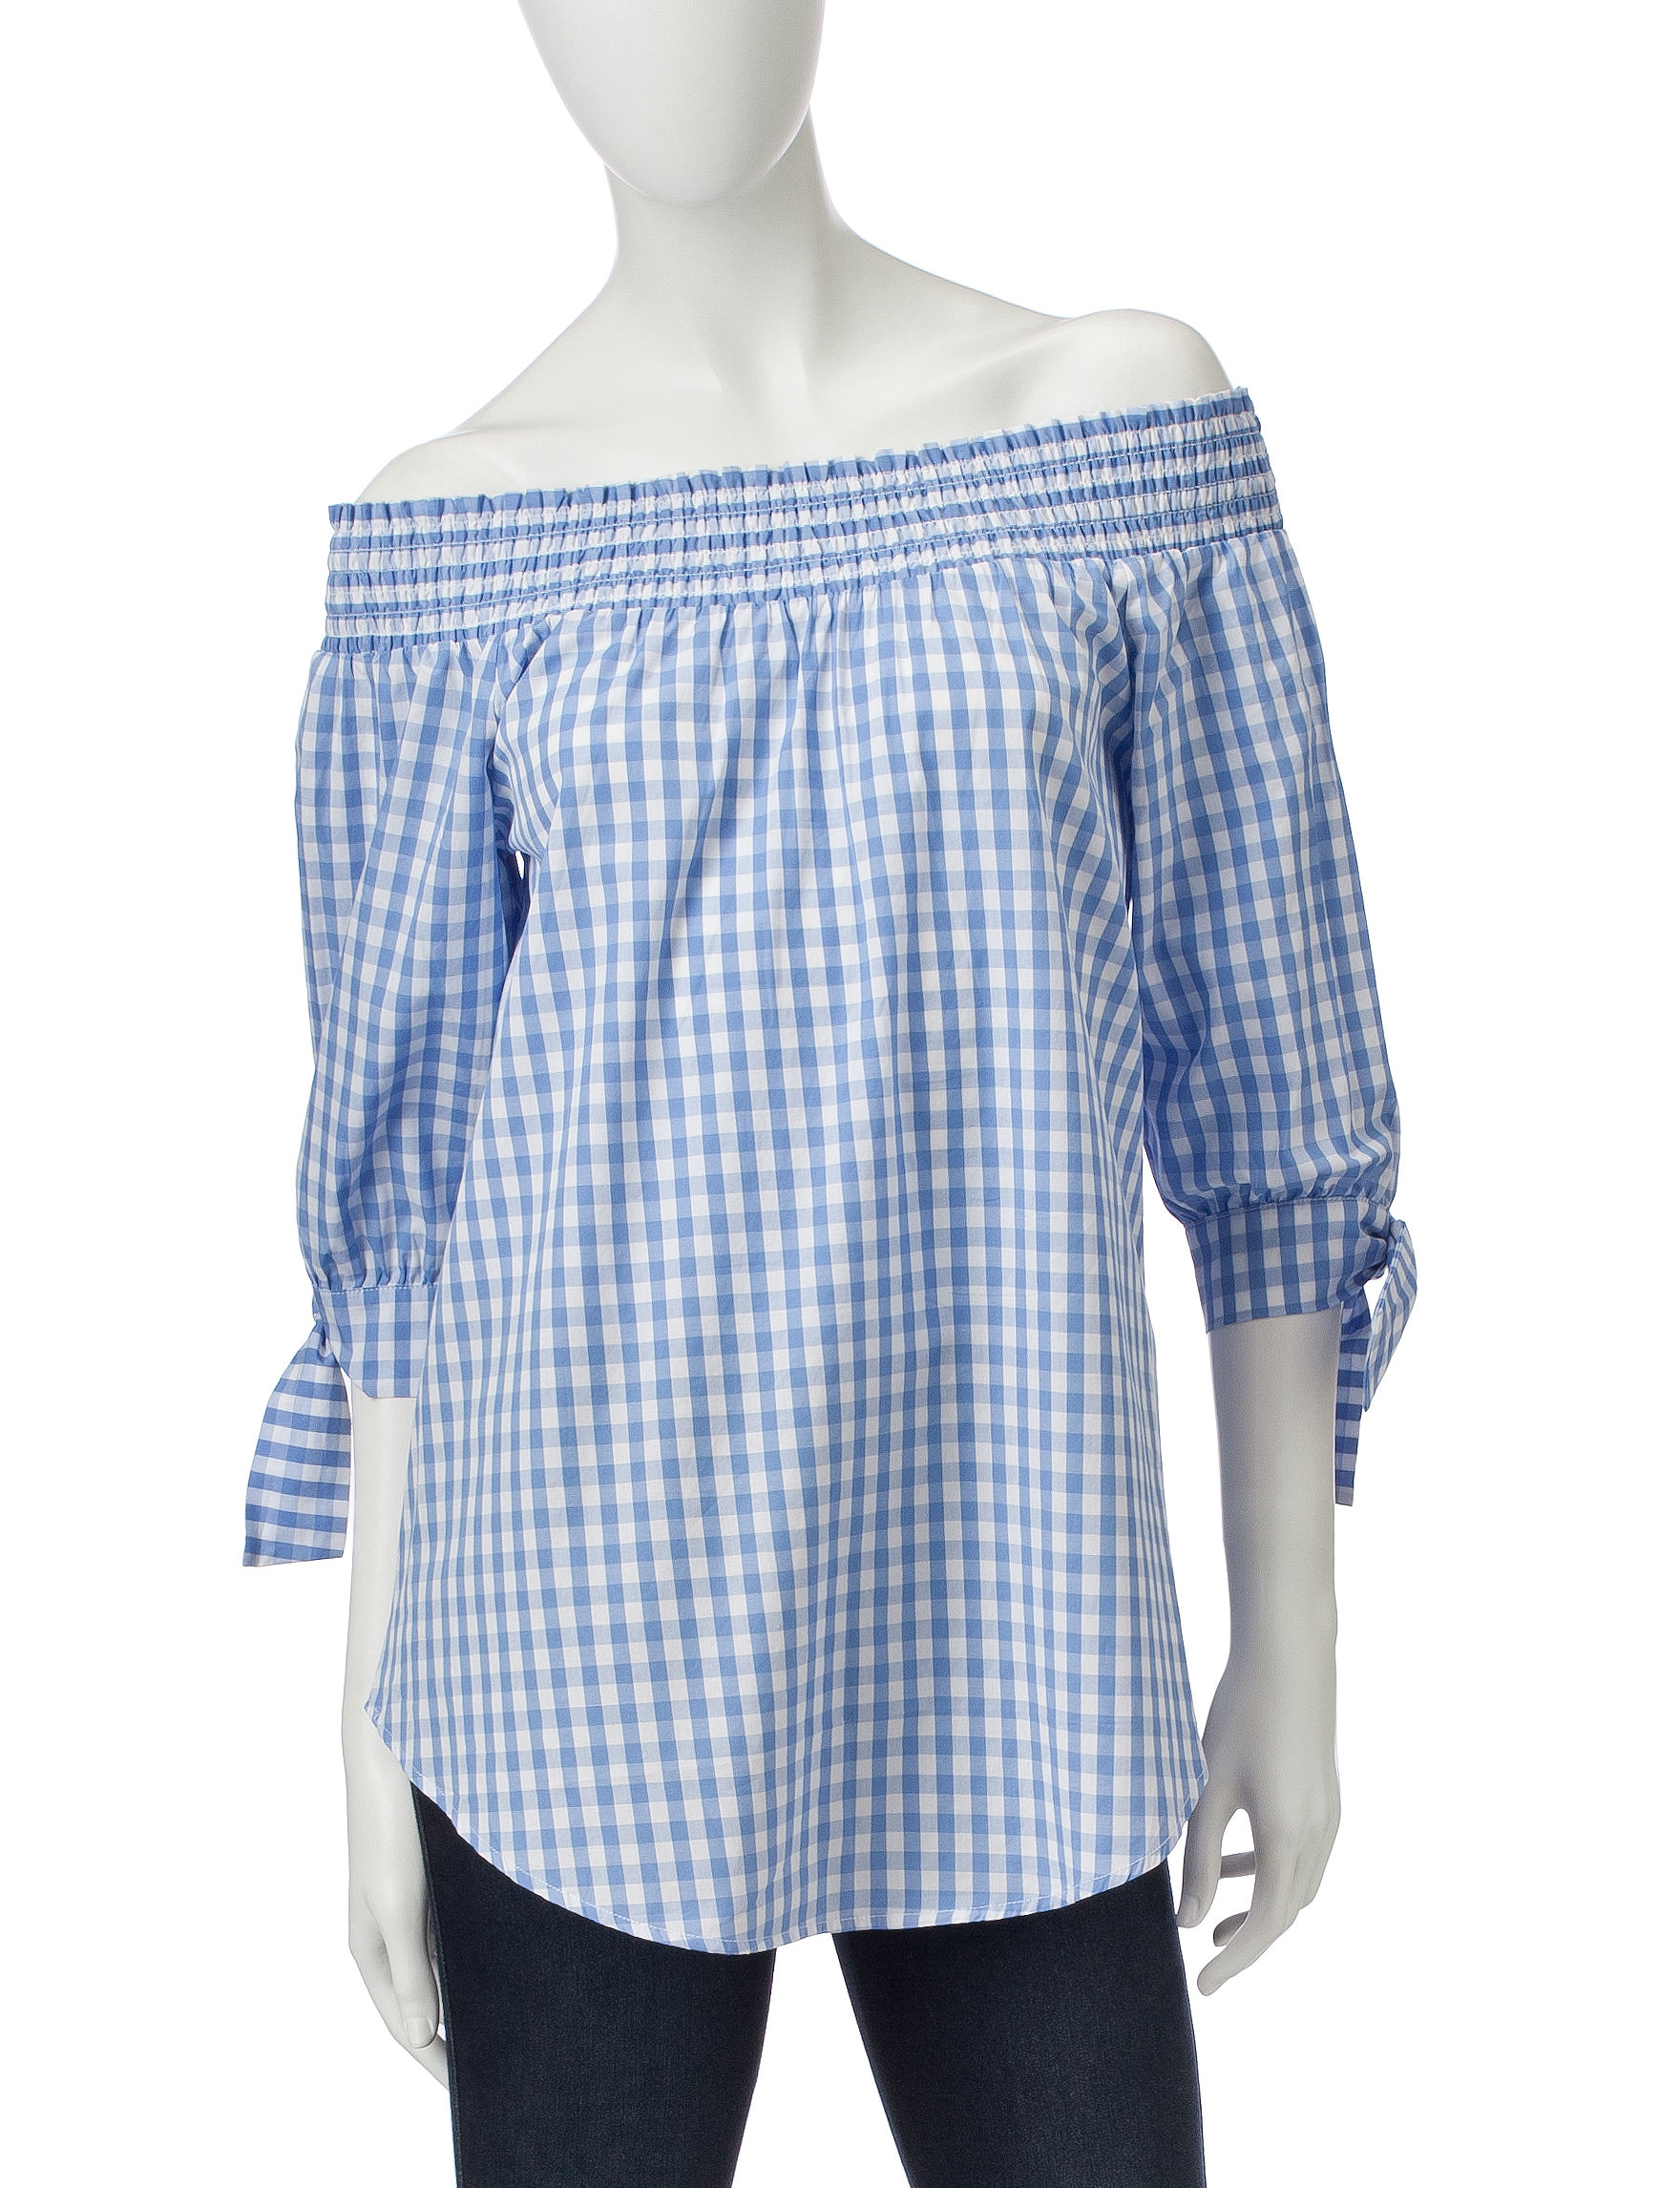 Signature Studio Blue / White Shirts & Blouses